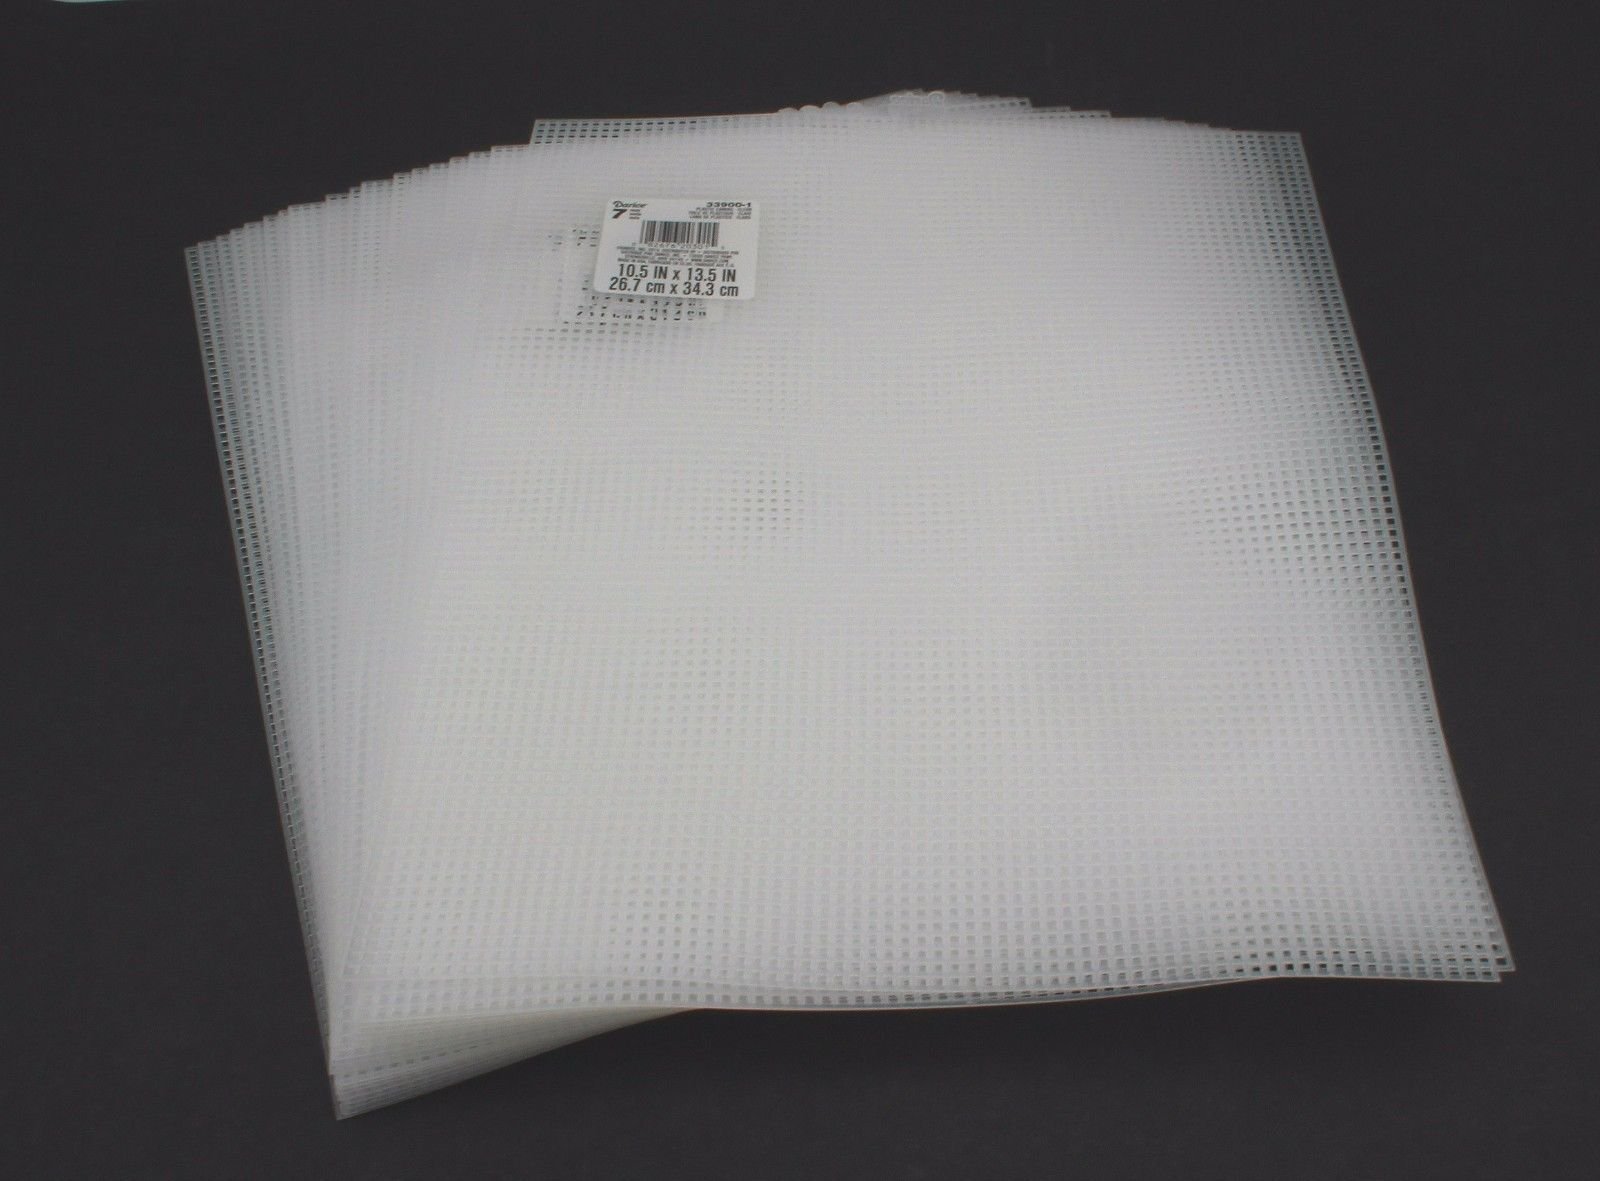 "Darice 7 Mesh CLEAR SUPER SOFT PLASTIC CANVAS 12/"" X 18/"" CLEAR 1 Sheet"